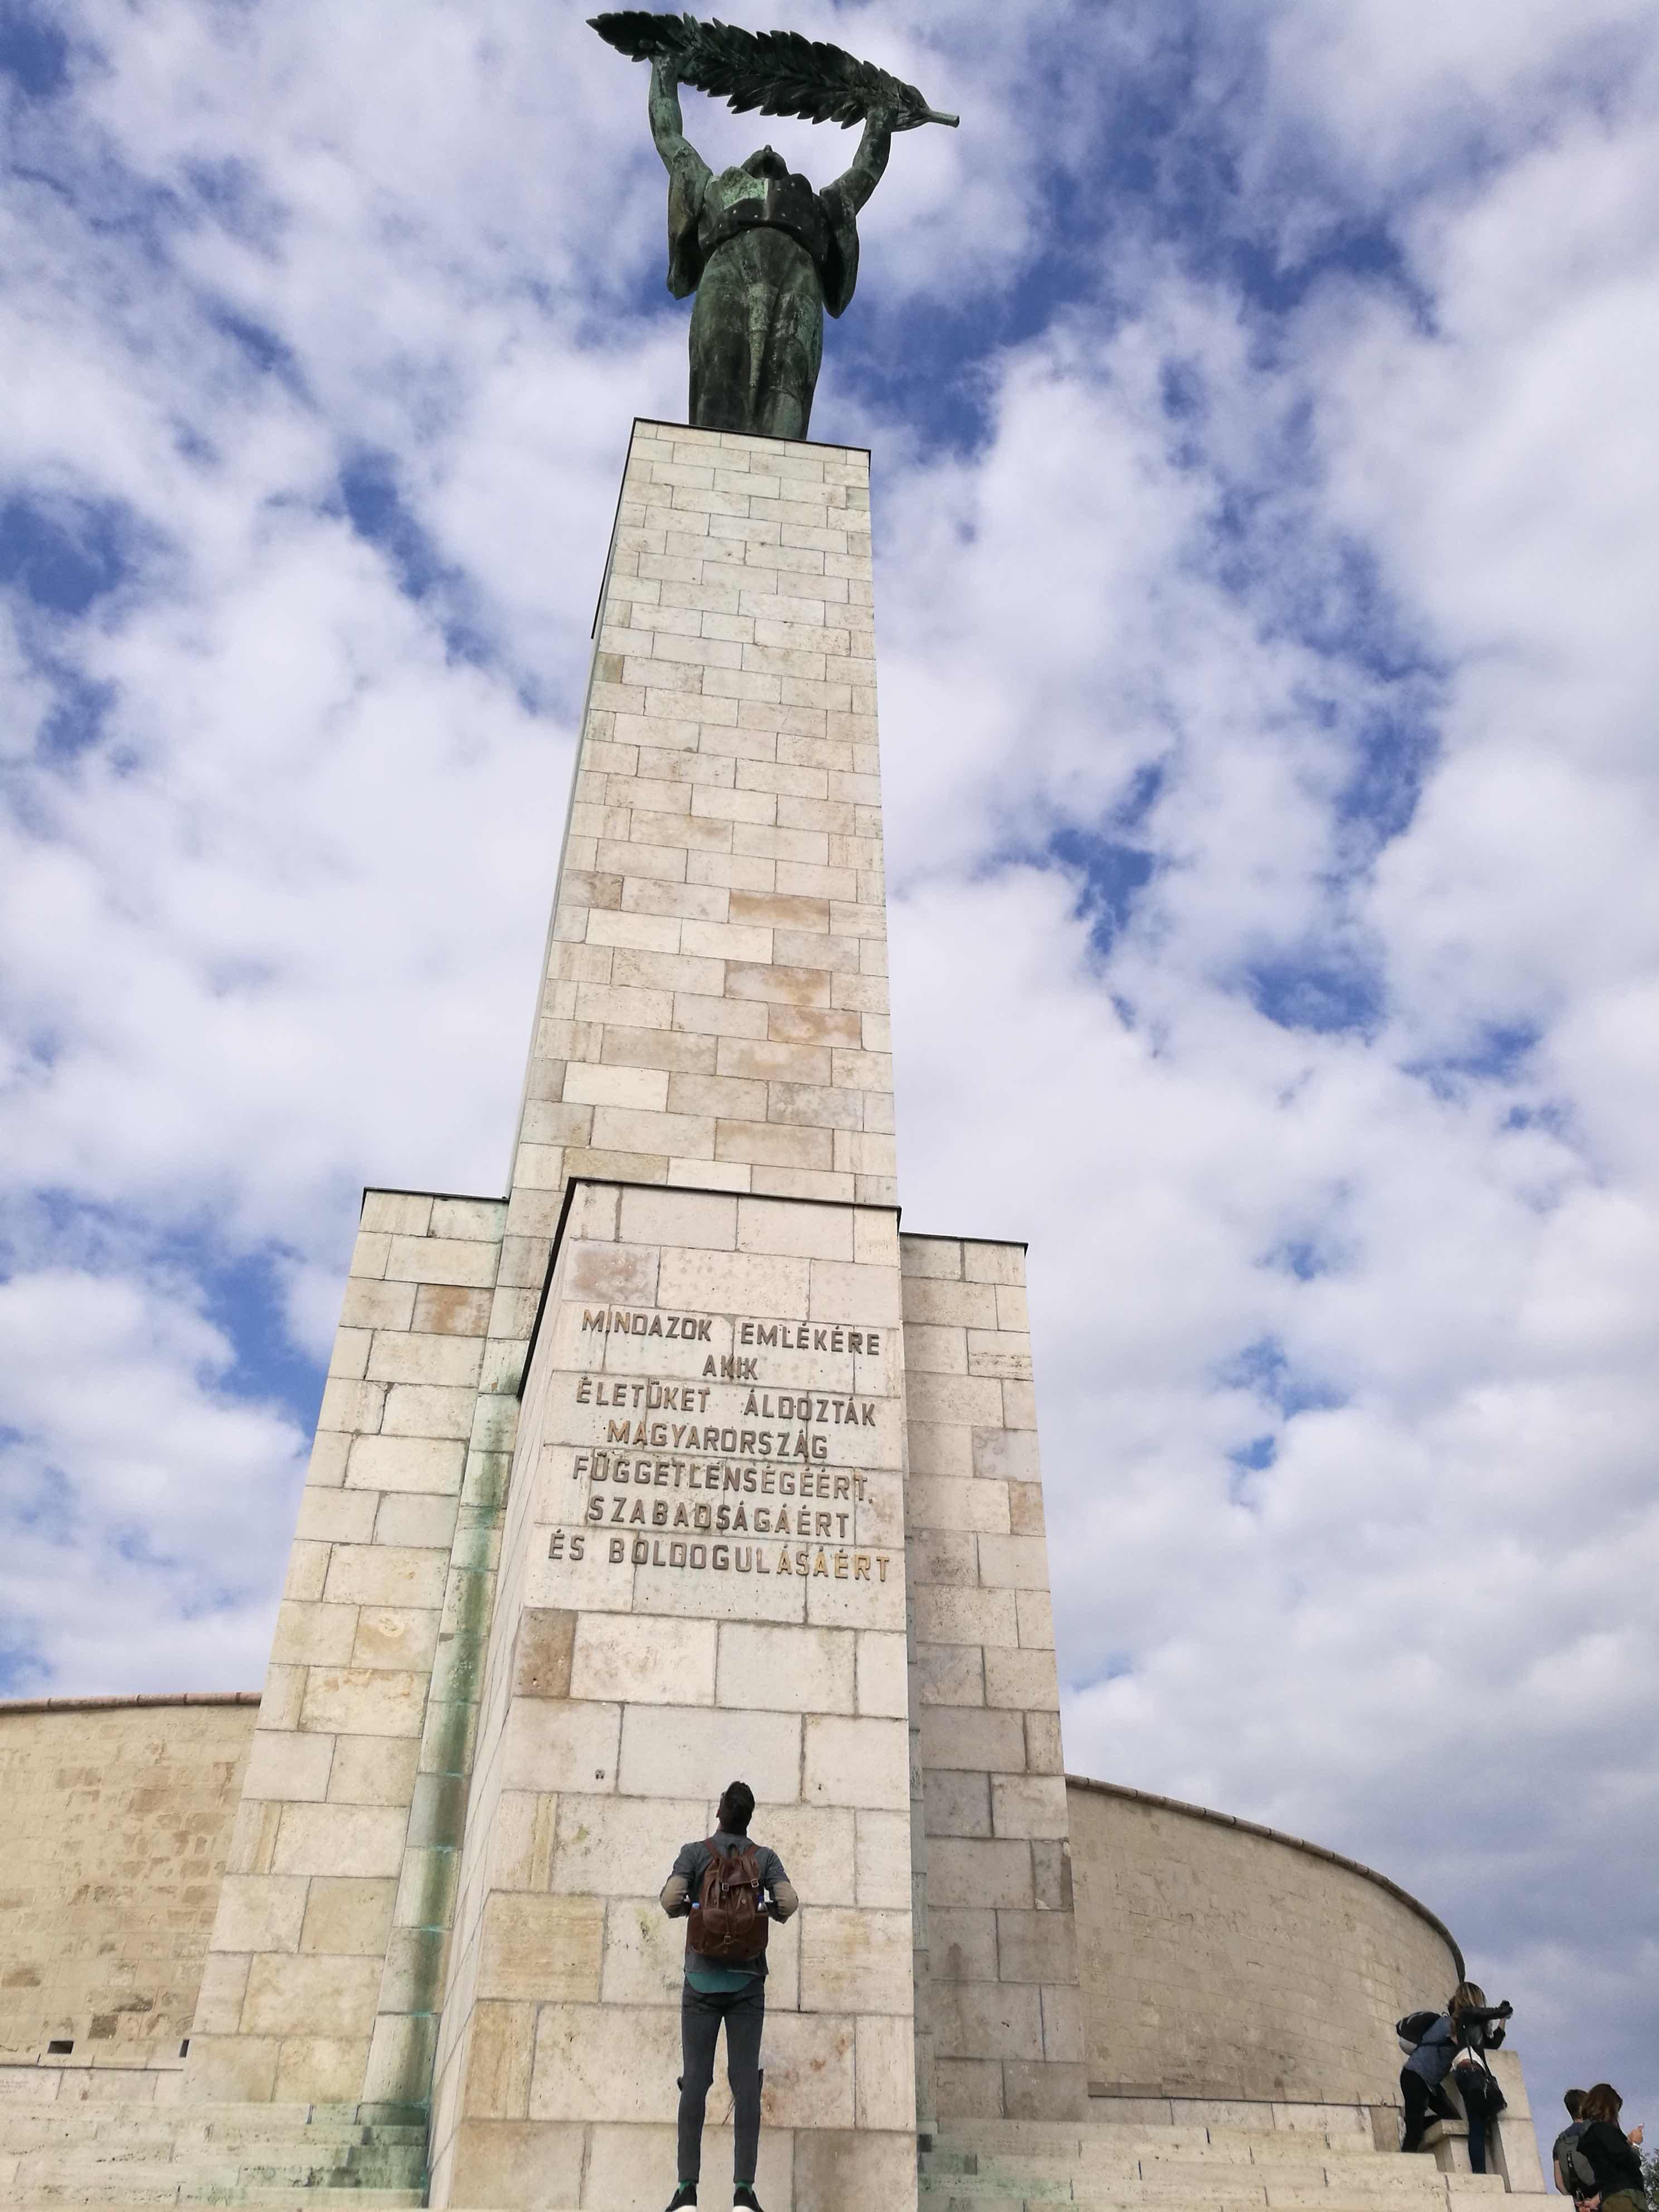 Liberty Statue image by Gabriella Brondani Rego